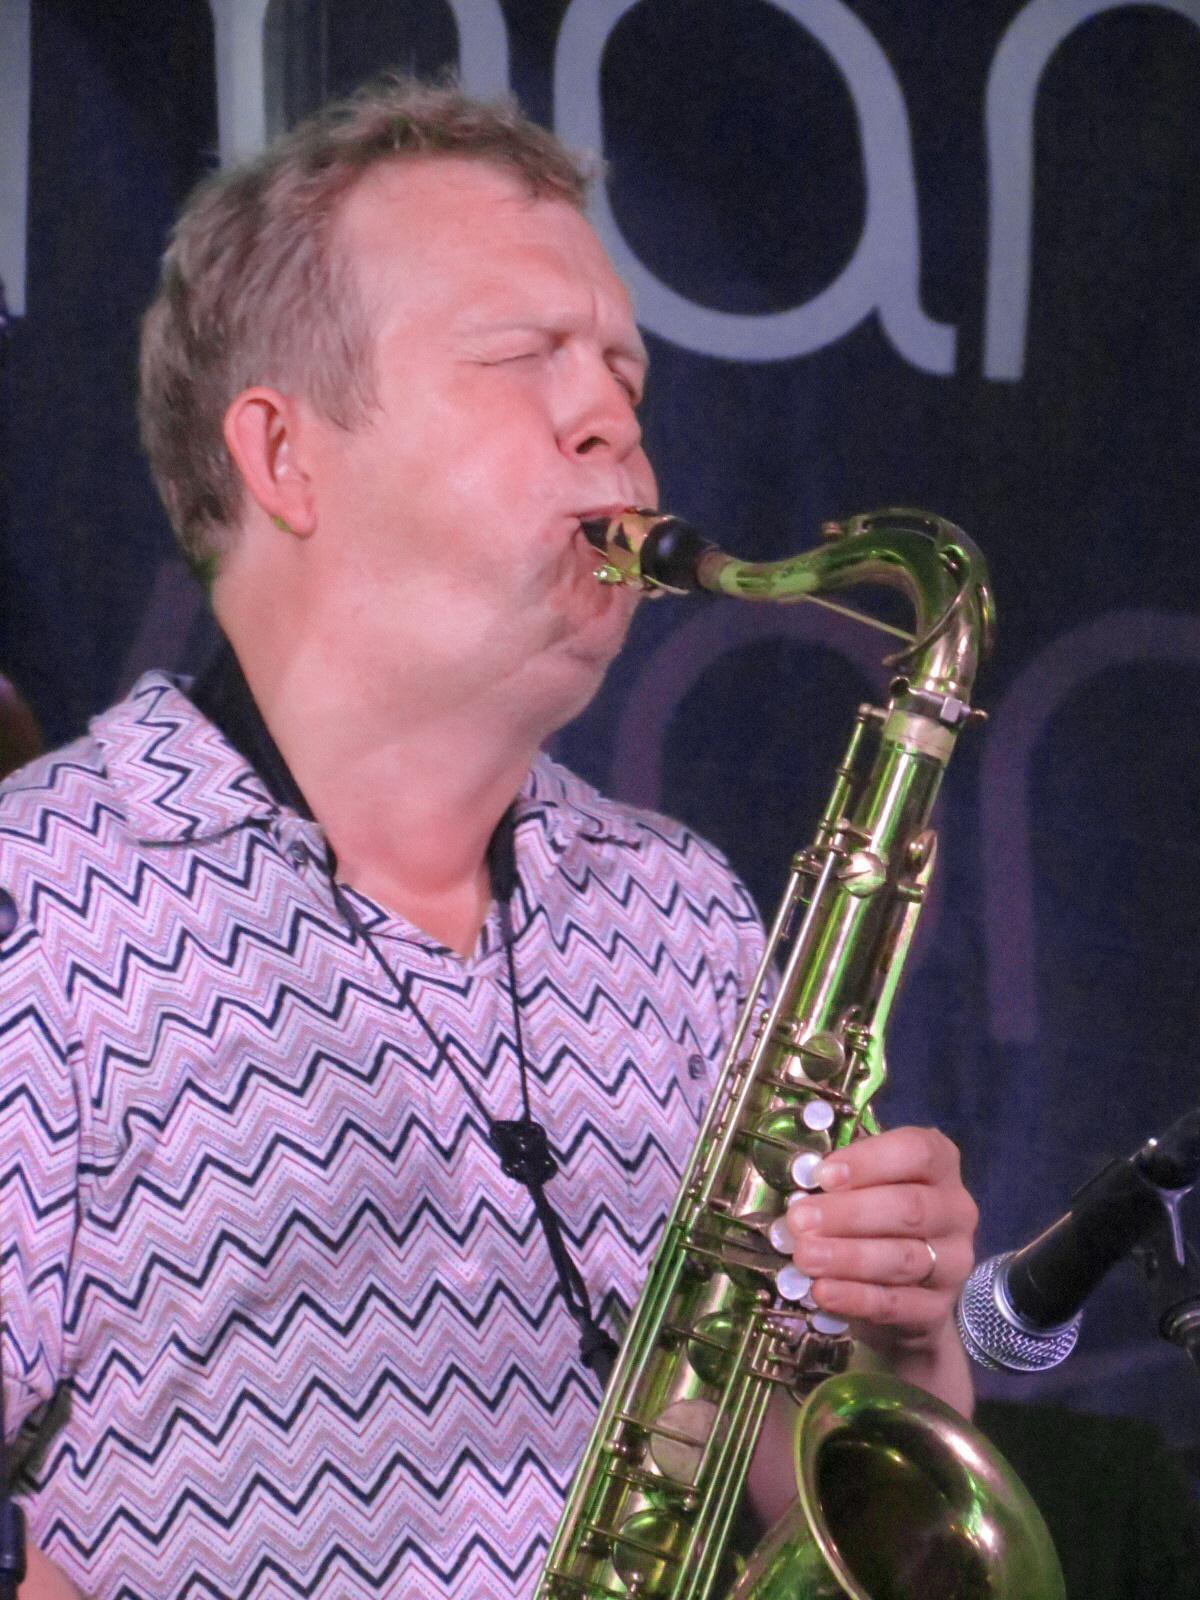 Fredrik Ljungvkist with Atomic at 2013 Chicago Jazz Festival